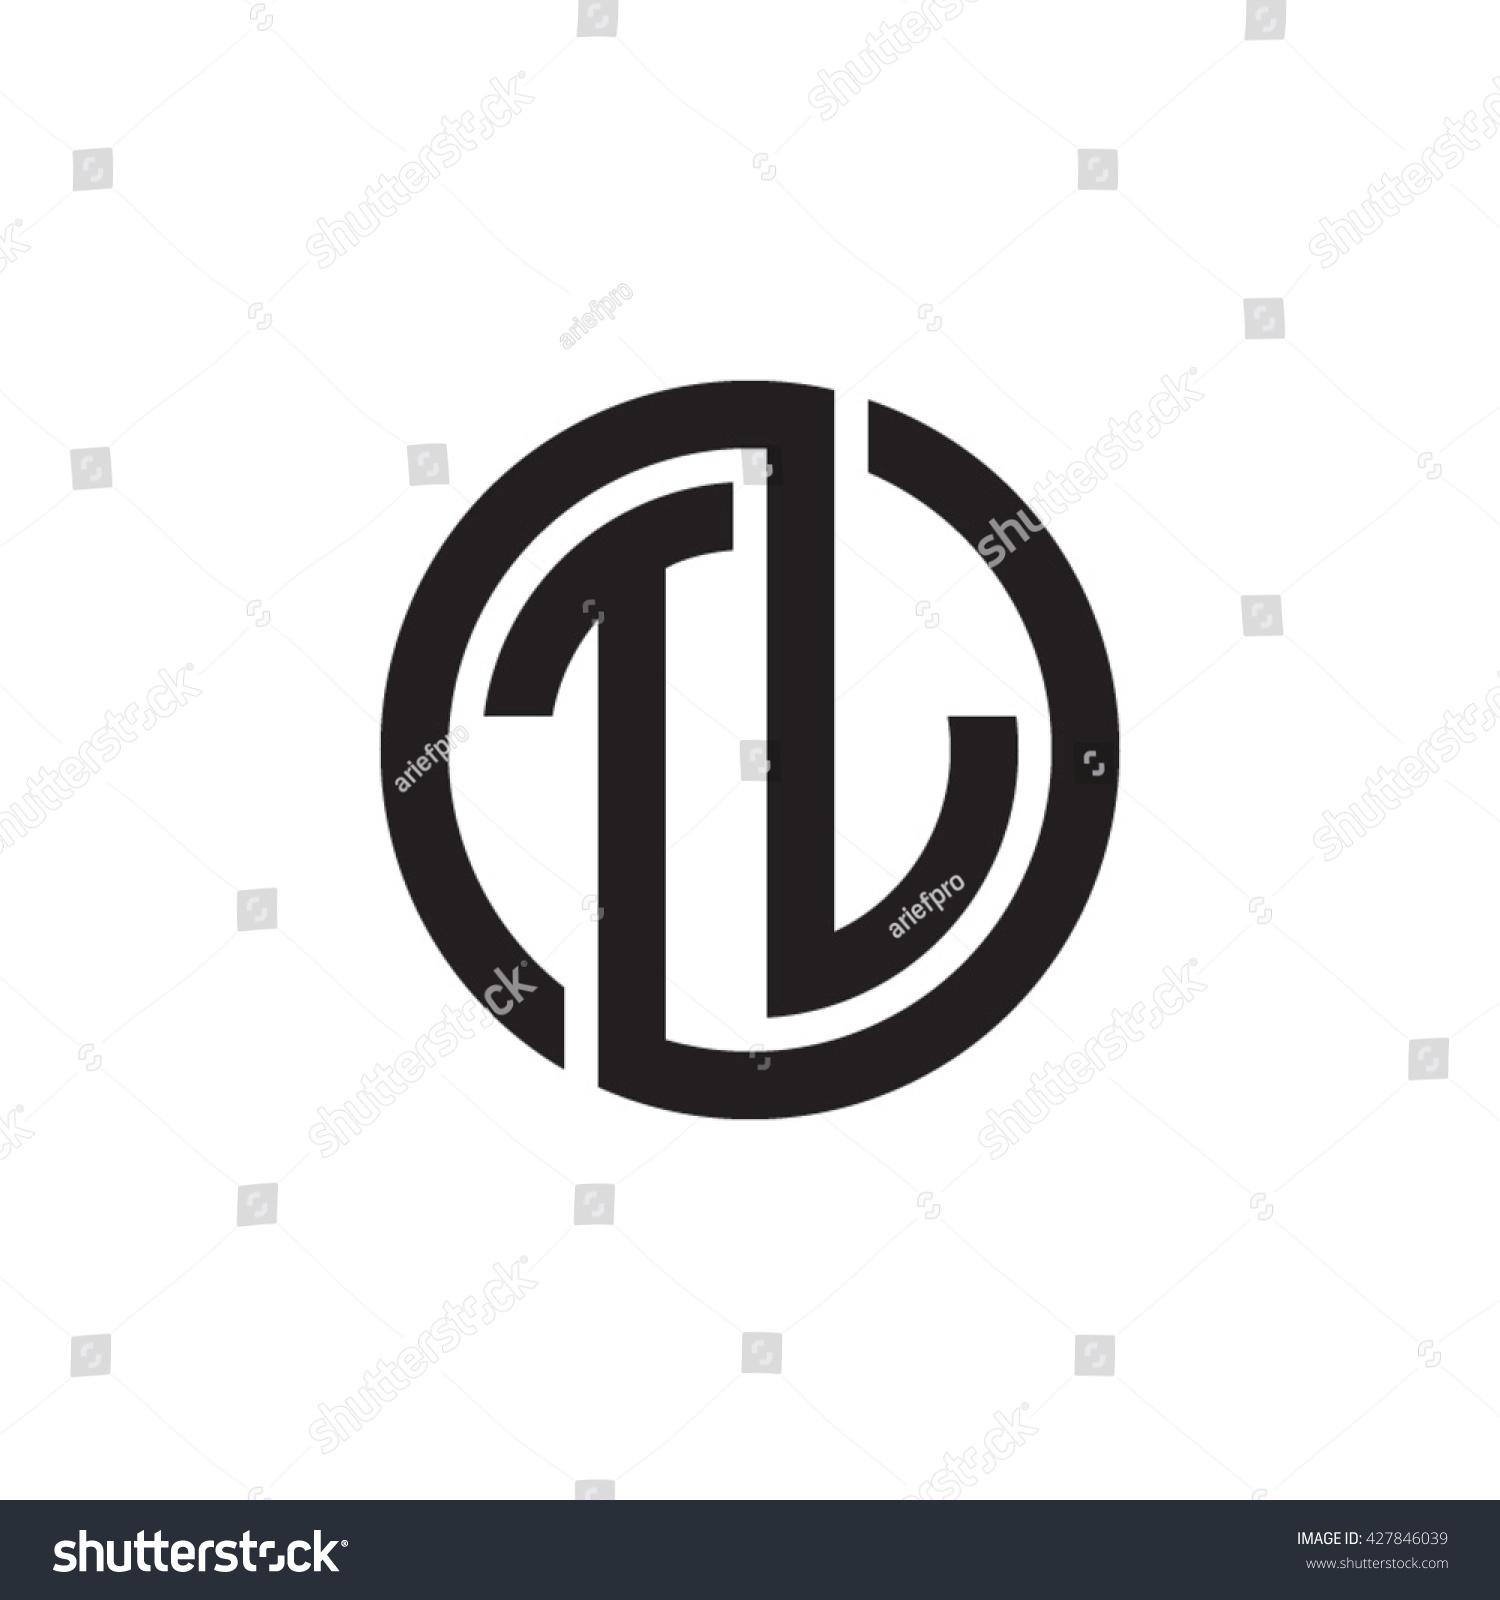 Tj initial luxury ornament monogram logo stock vector - Tj Initial Letters Looping Linked Circle Monogram Logo Stock Vector Illustration 427846039 Shutterstock